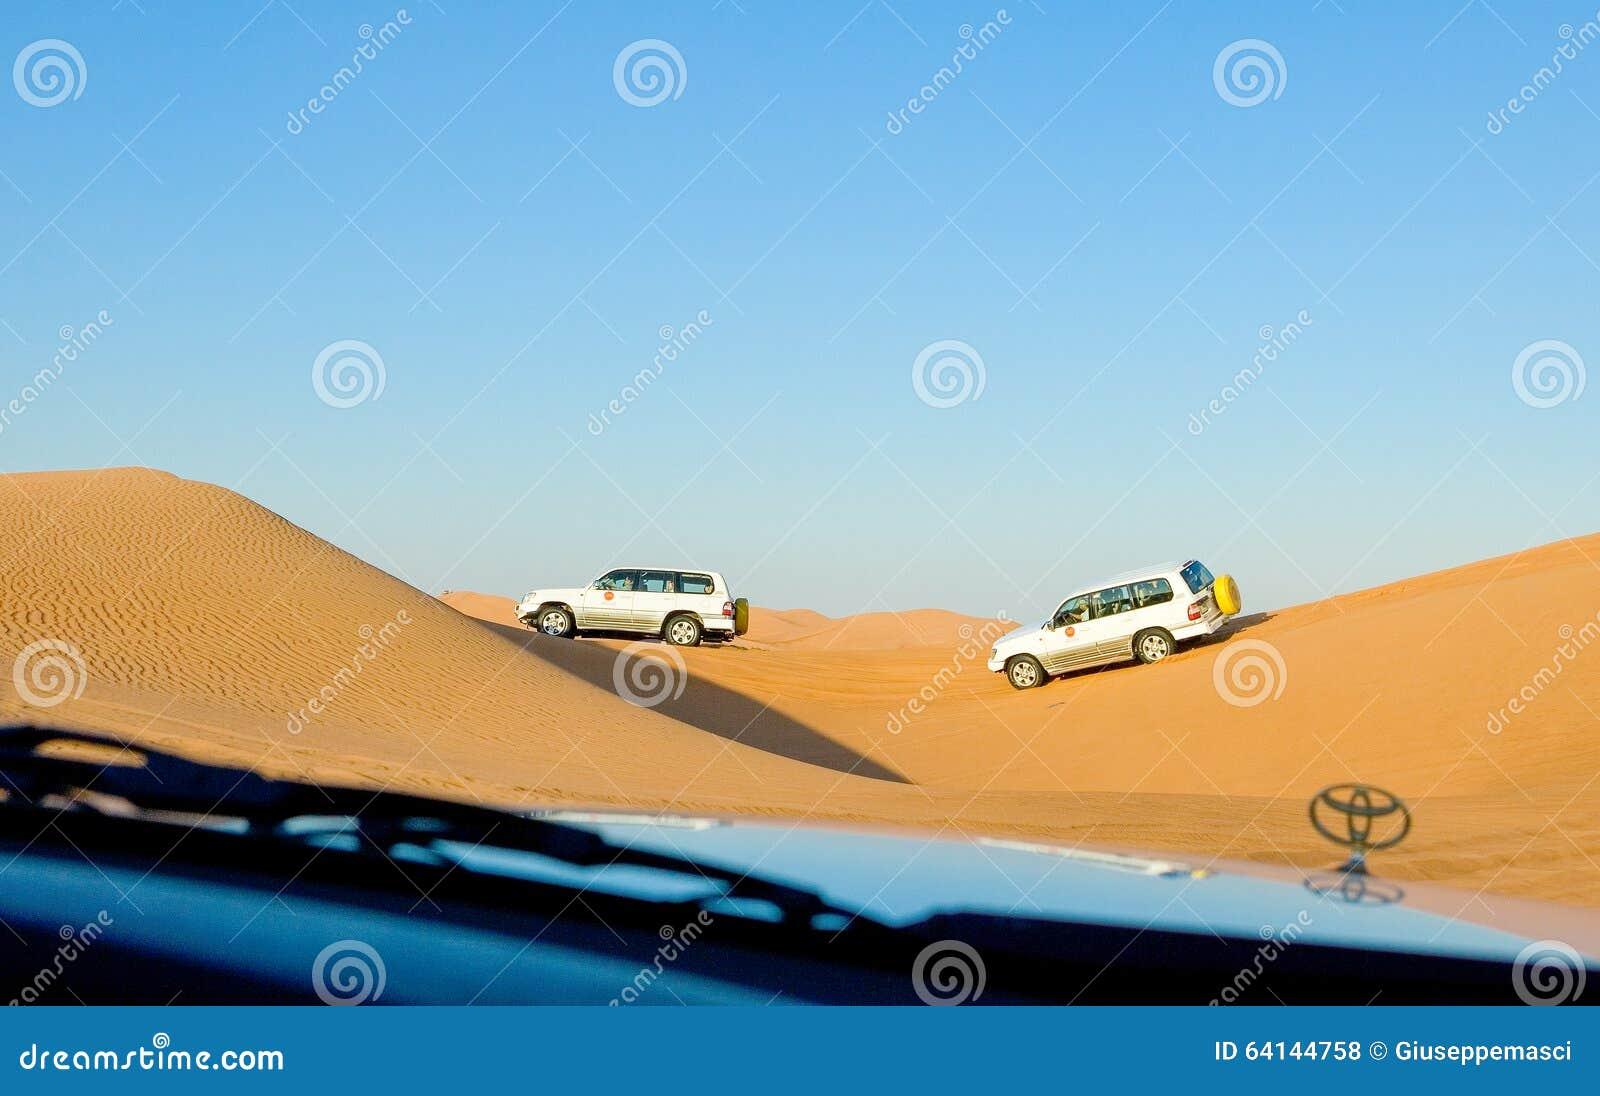 Used Car Dealership Palm Desert